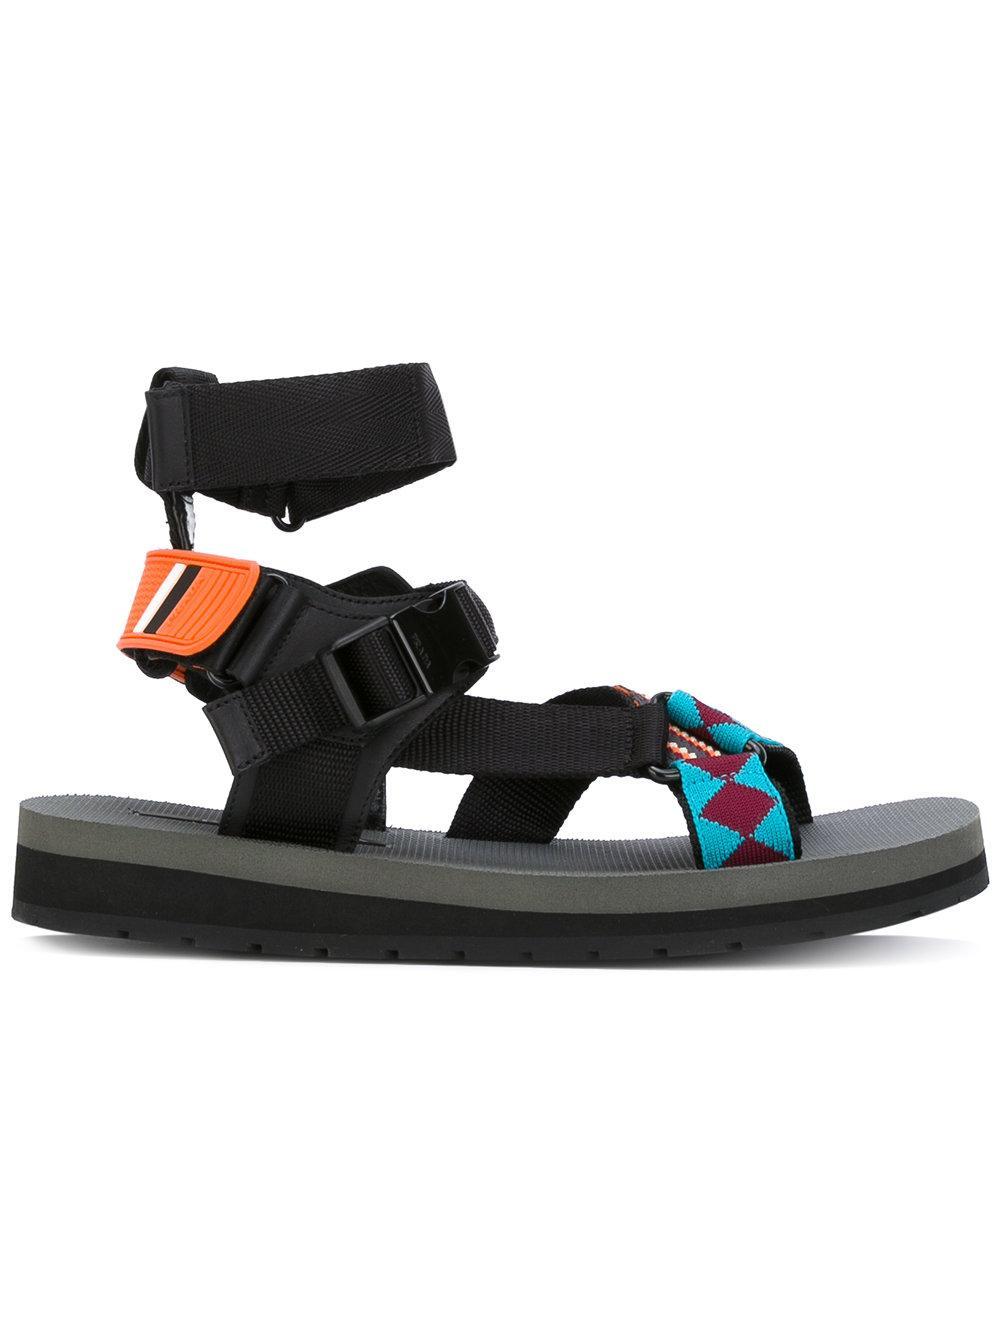 Prada Polyester Sandals hkSgKKCwX